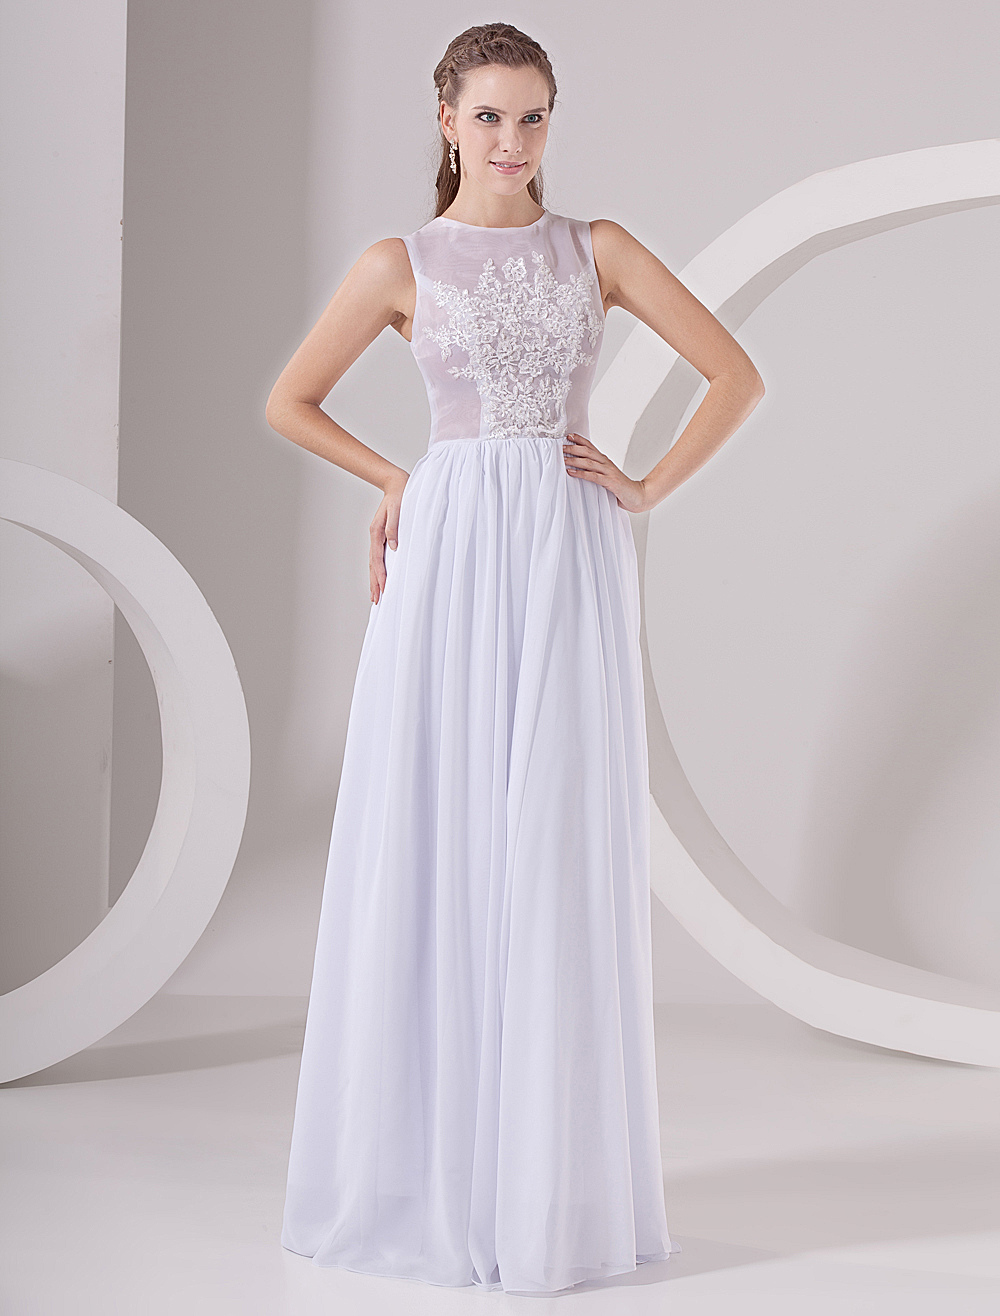 White Chiffon Ladies Special Occasion Dress - Milanoo.com